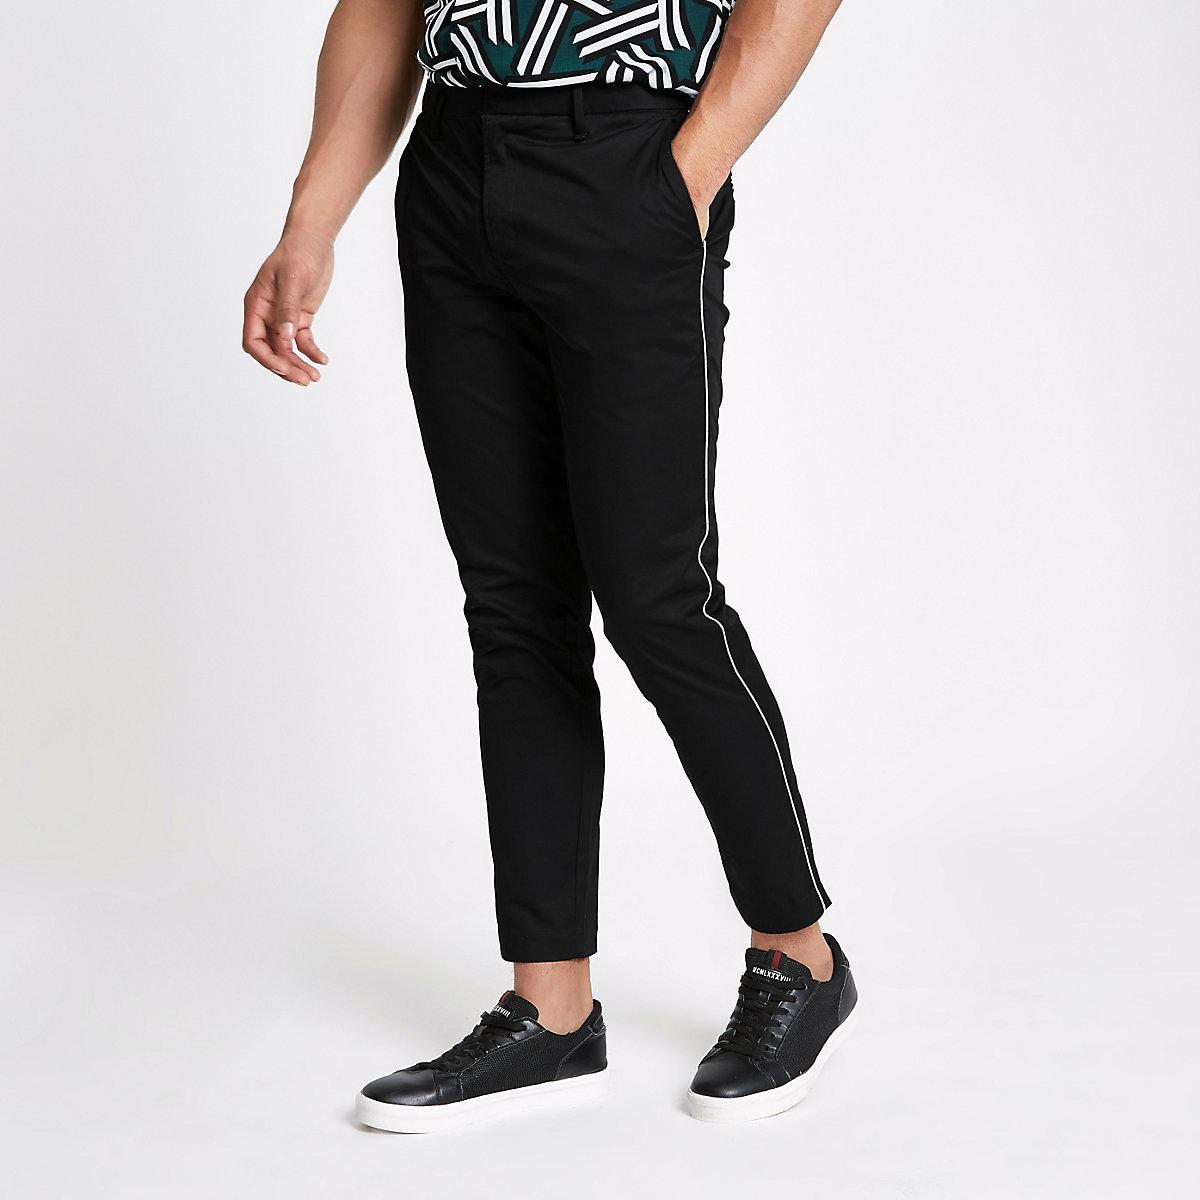 Black pipe skinny fit chino pants